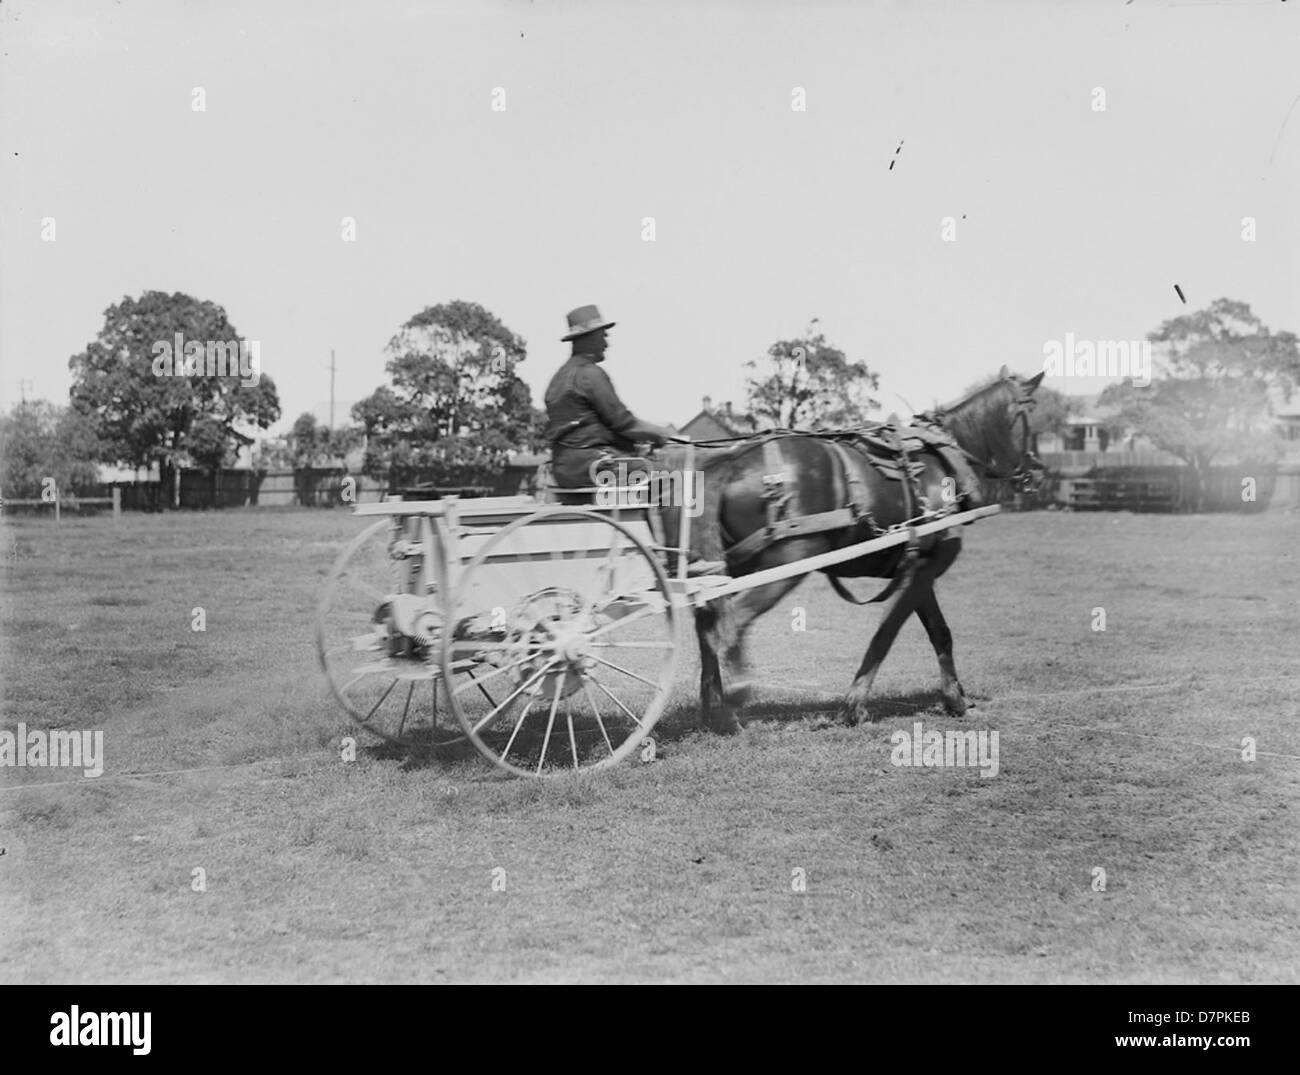 Horsedrawn ground driven fertiliser spreader with driver - Stock Image